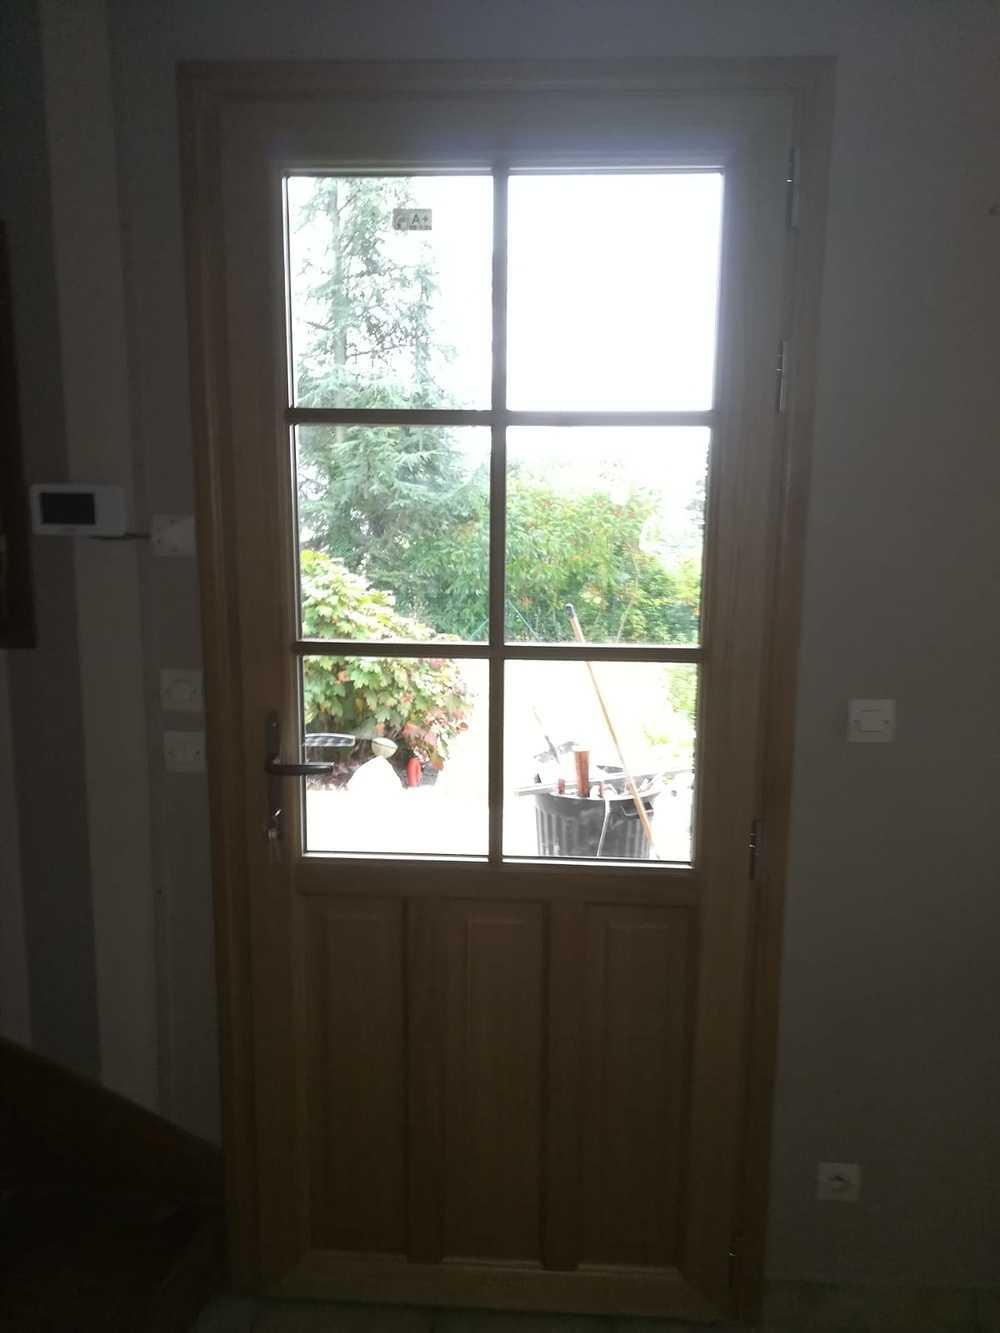 Porte d''entrée classique type fermière- Dinan -aluminium 916a2d0c-f07a-4fe4-b0ad-995b8784c966